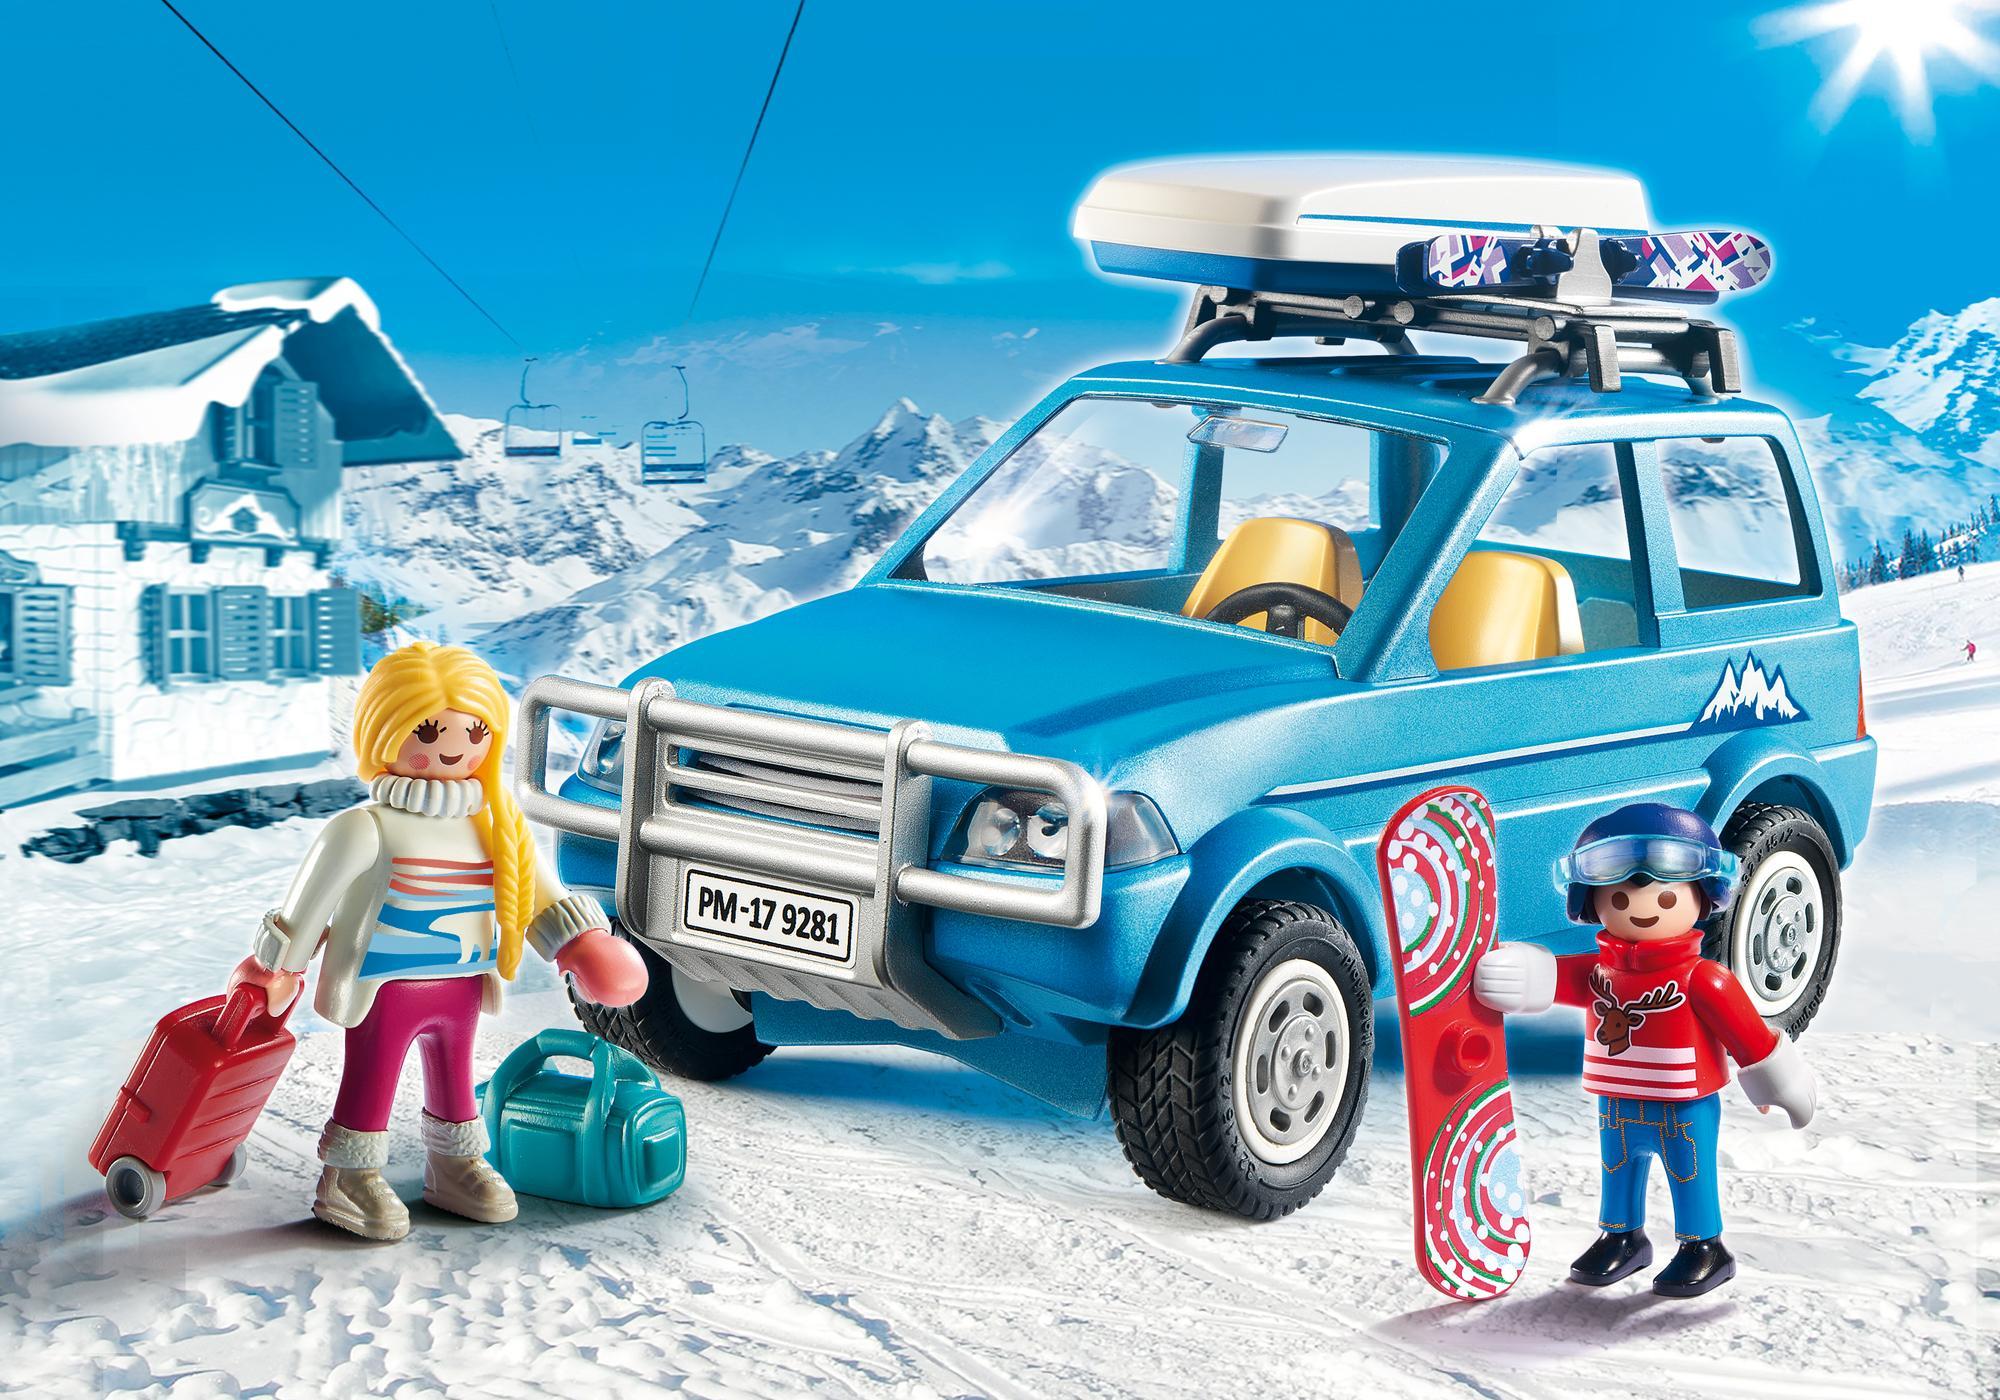 http://media.playmobil.com/i/playmobil/9281_product_detail/Bil med tagboks